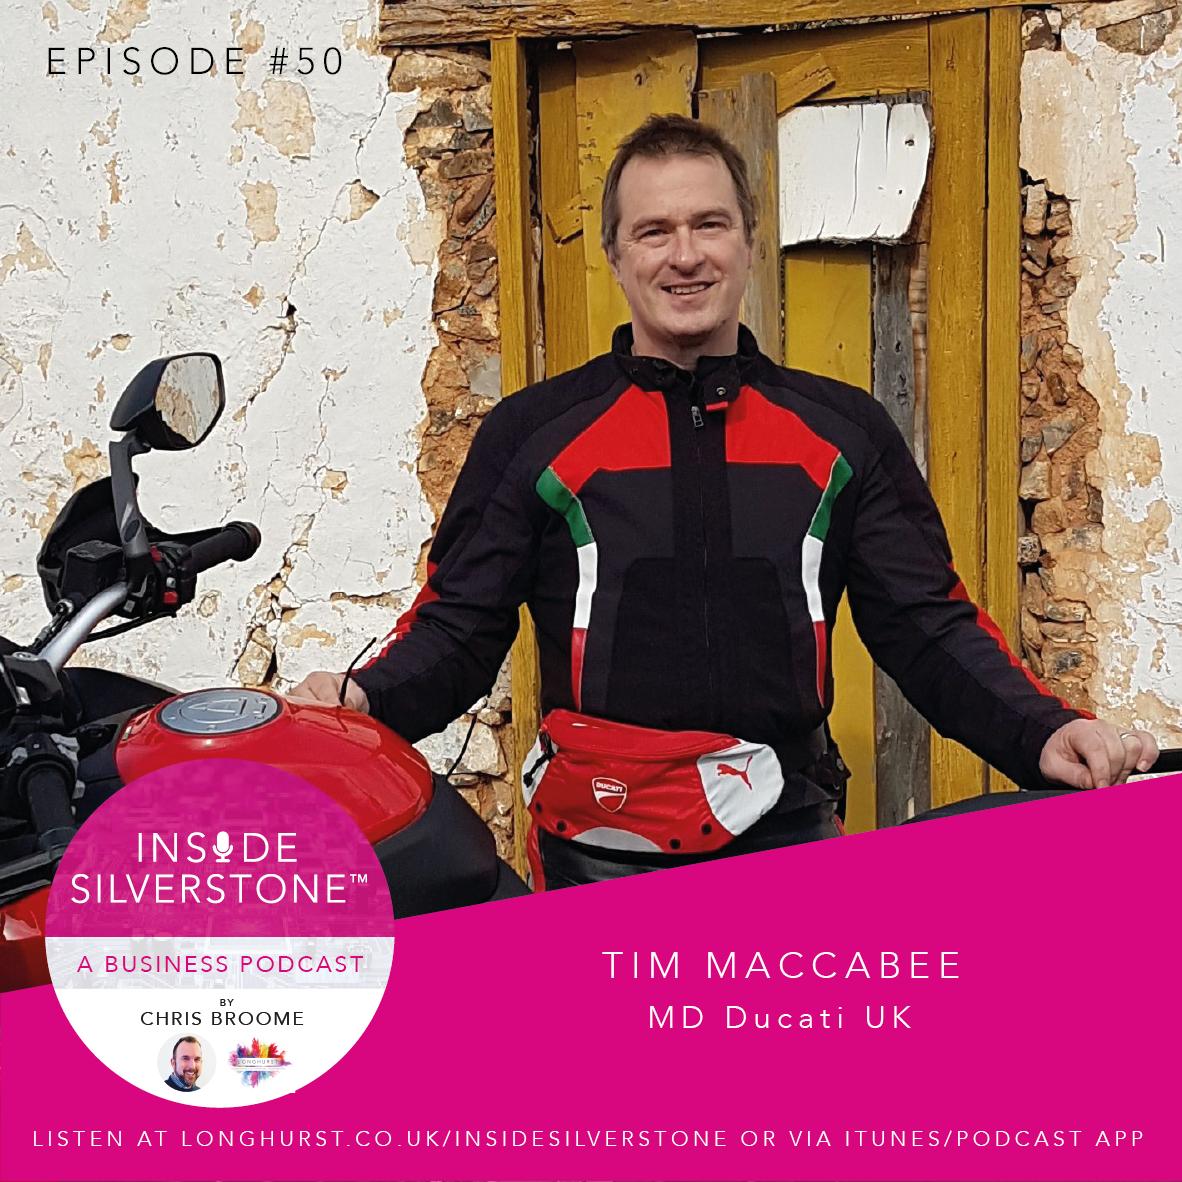 Tim Maccabee, Managing Director of Ducati UK